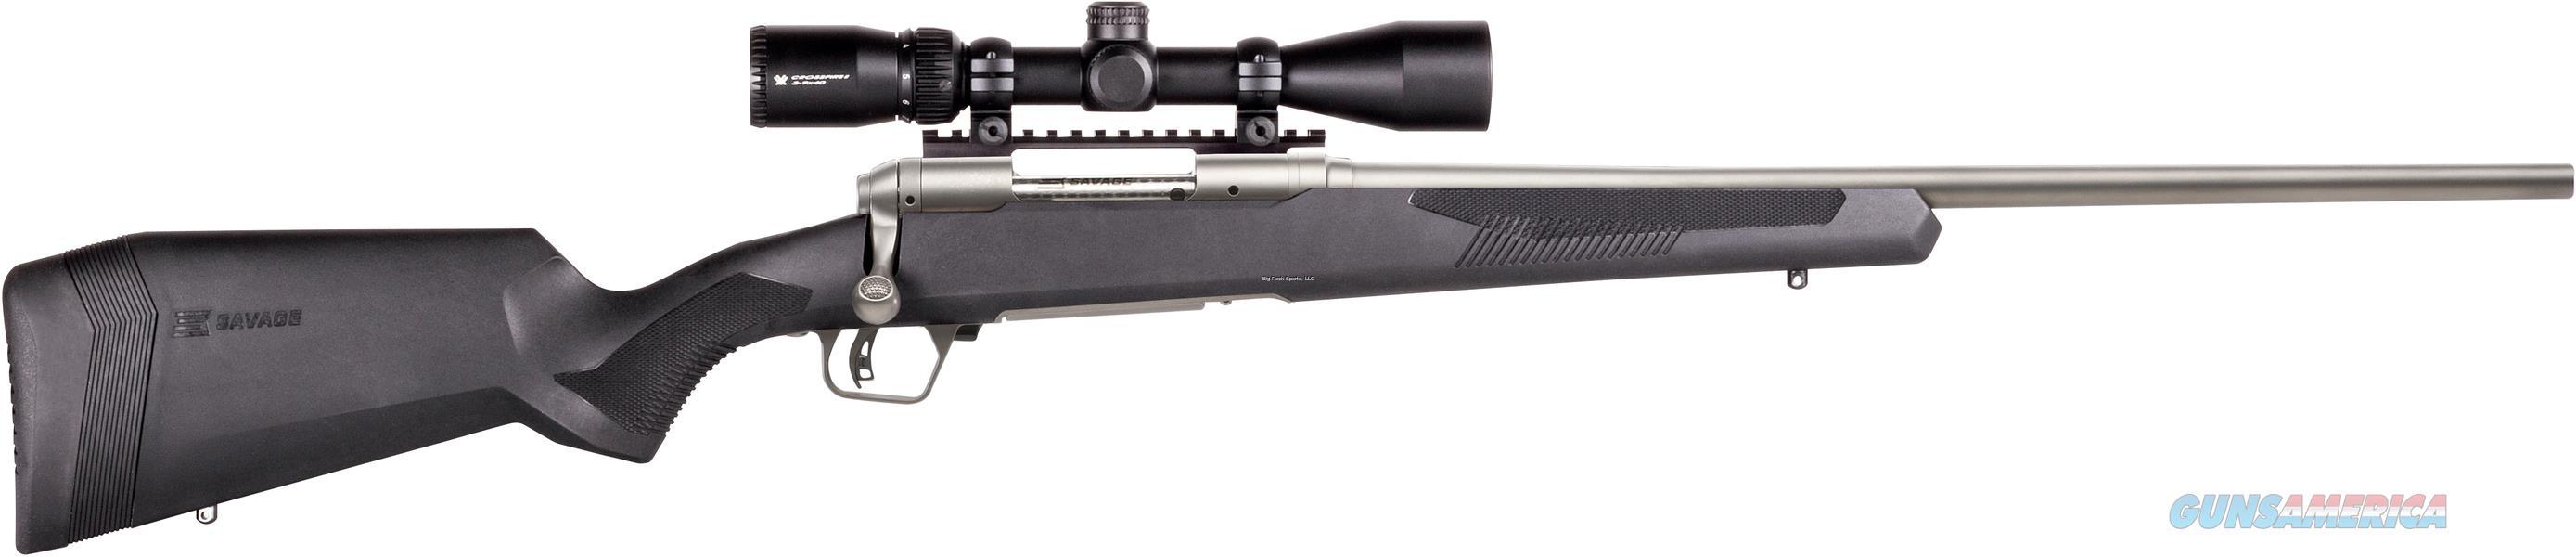 "Savage Arms 110 Apex Storm Xp, Bolt Action Rifle, .338 Win, 24"" Ss Bbl, Blk Syn Stock, Adjust Lop, Accu-Trig, Vortex 3-9X40 Scope 57355  Guns > Rifles > S Misc Rifles"